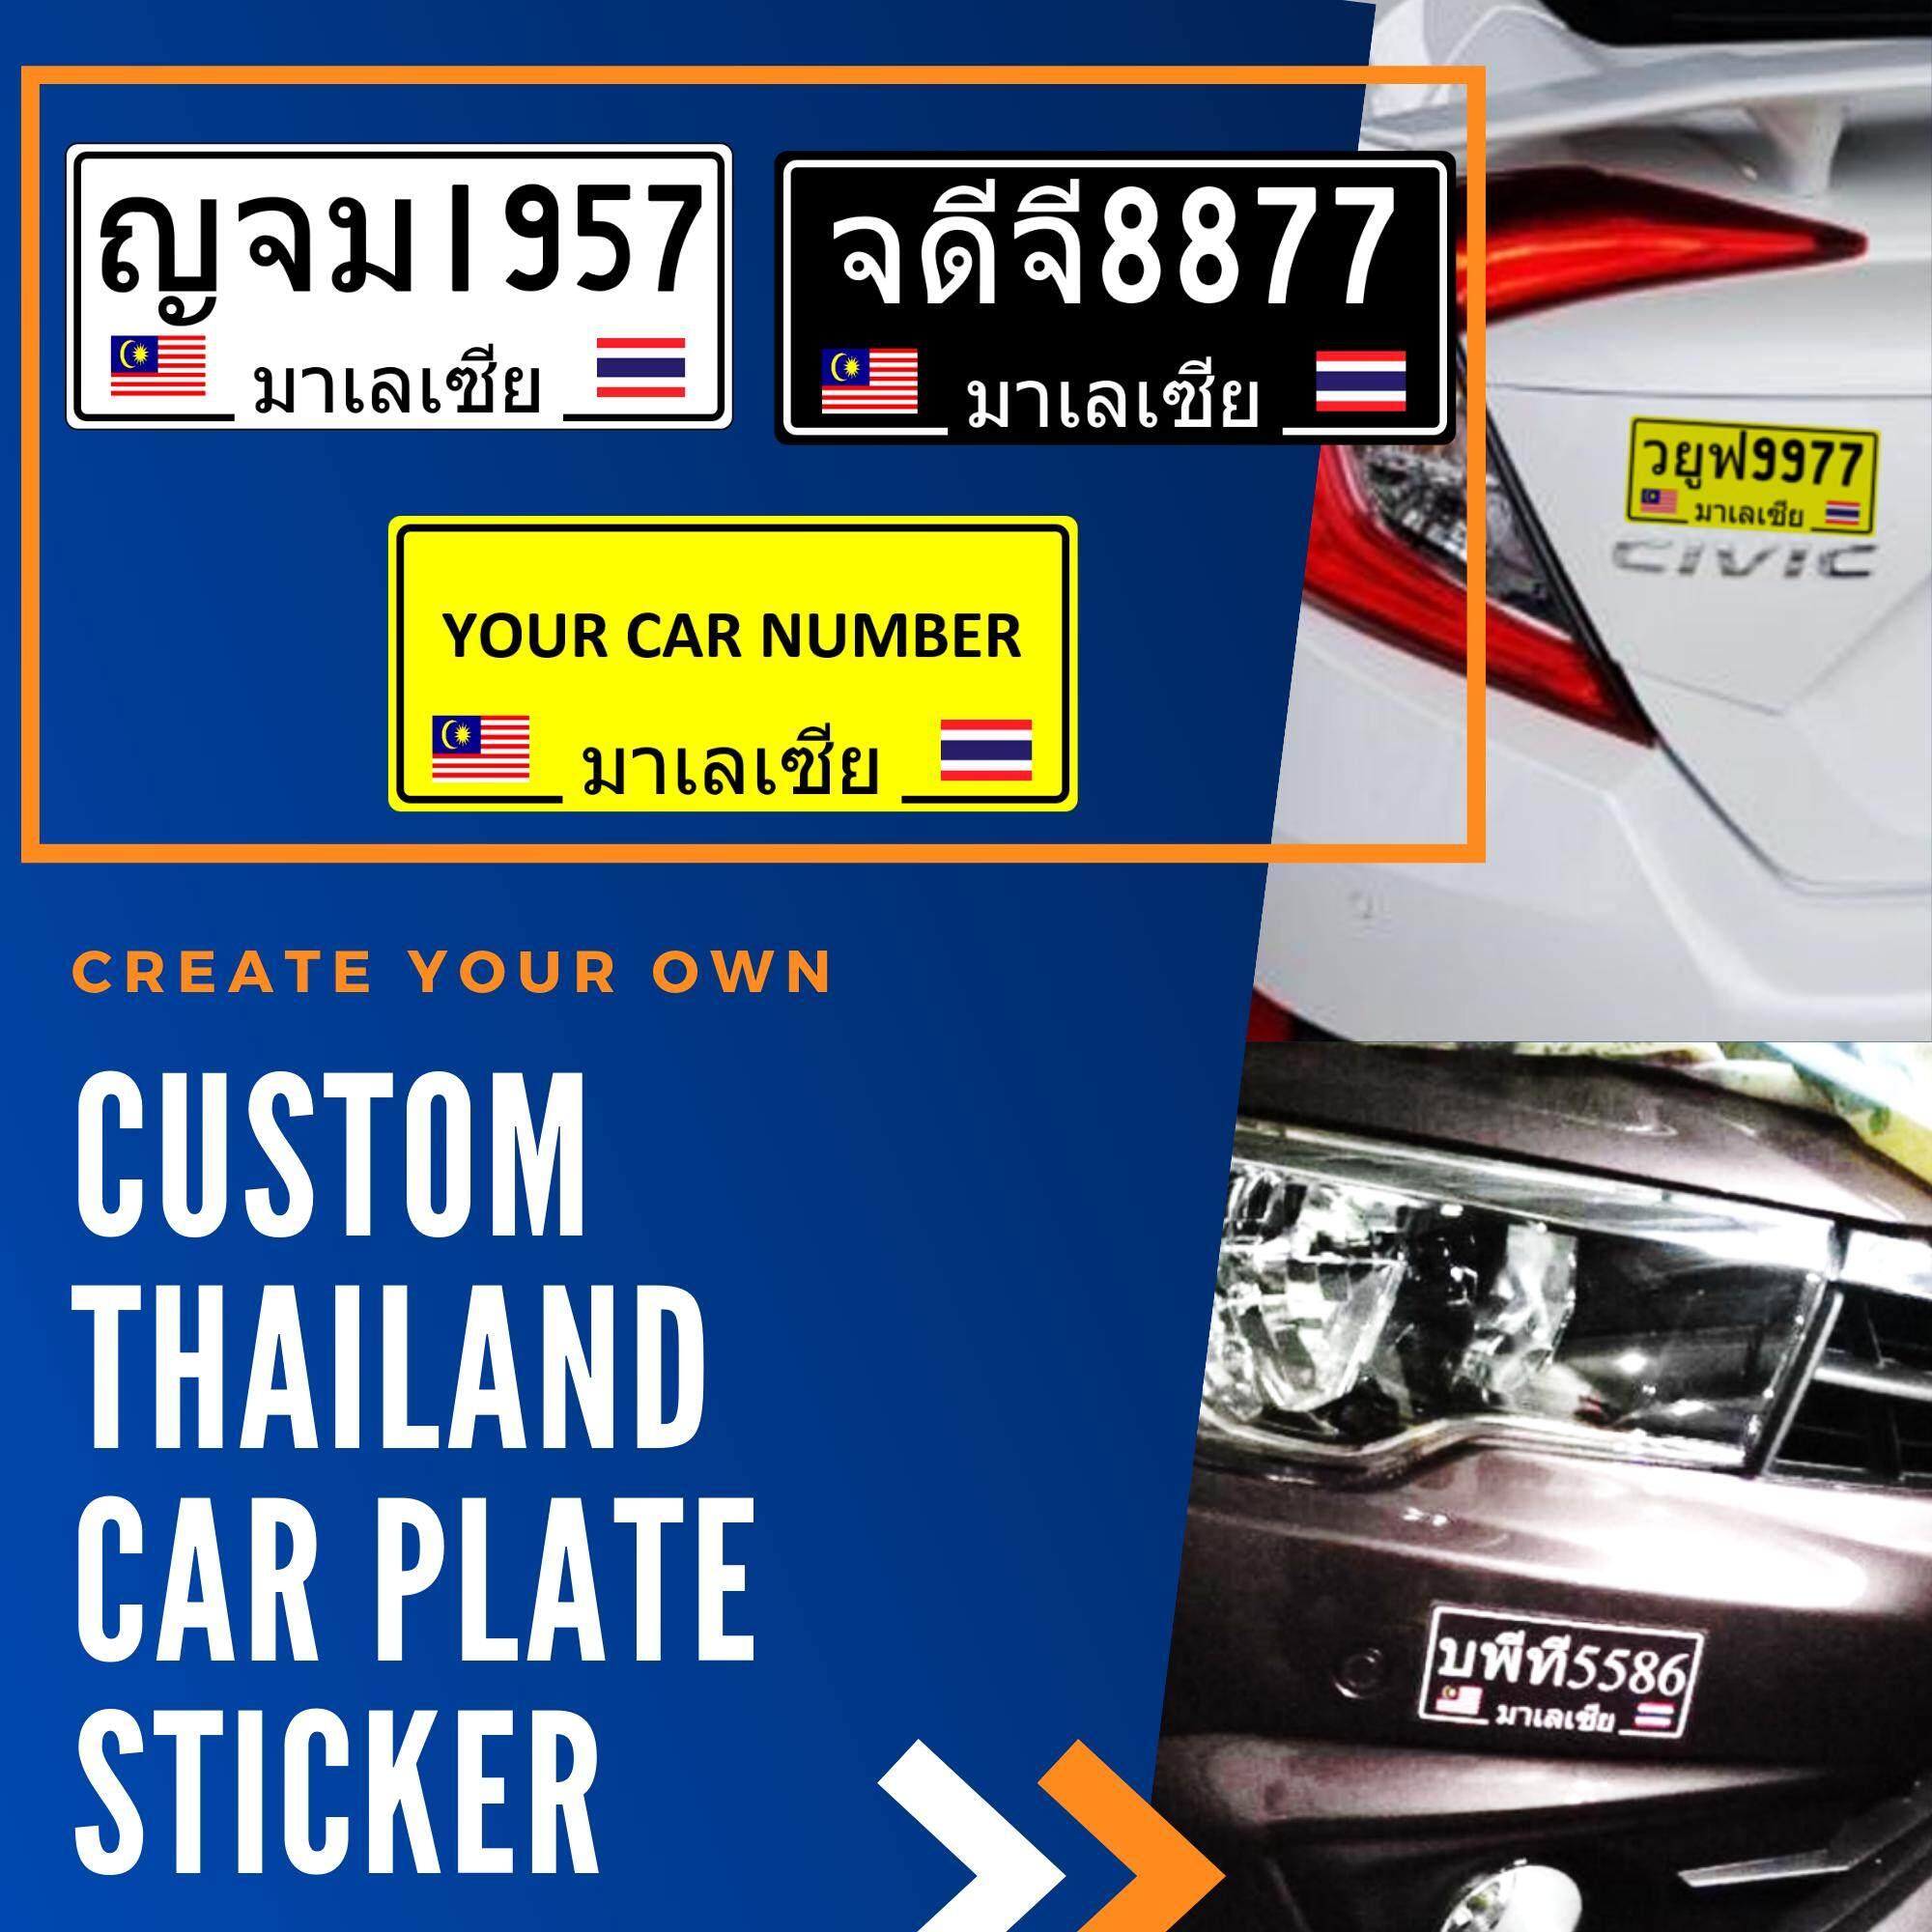 CUSTOM THAILAND CAR PLATE STICKER  STICKER PLATE THAILAND